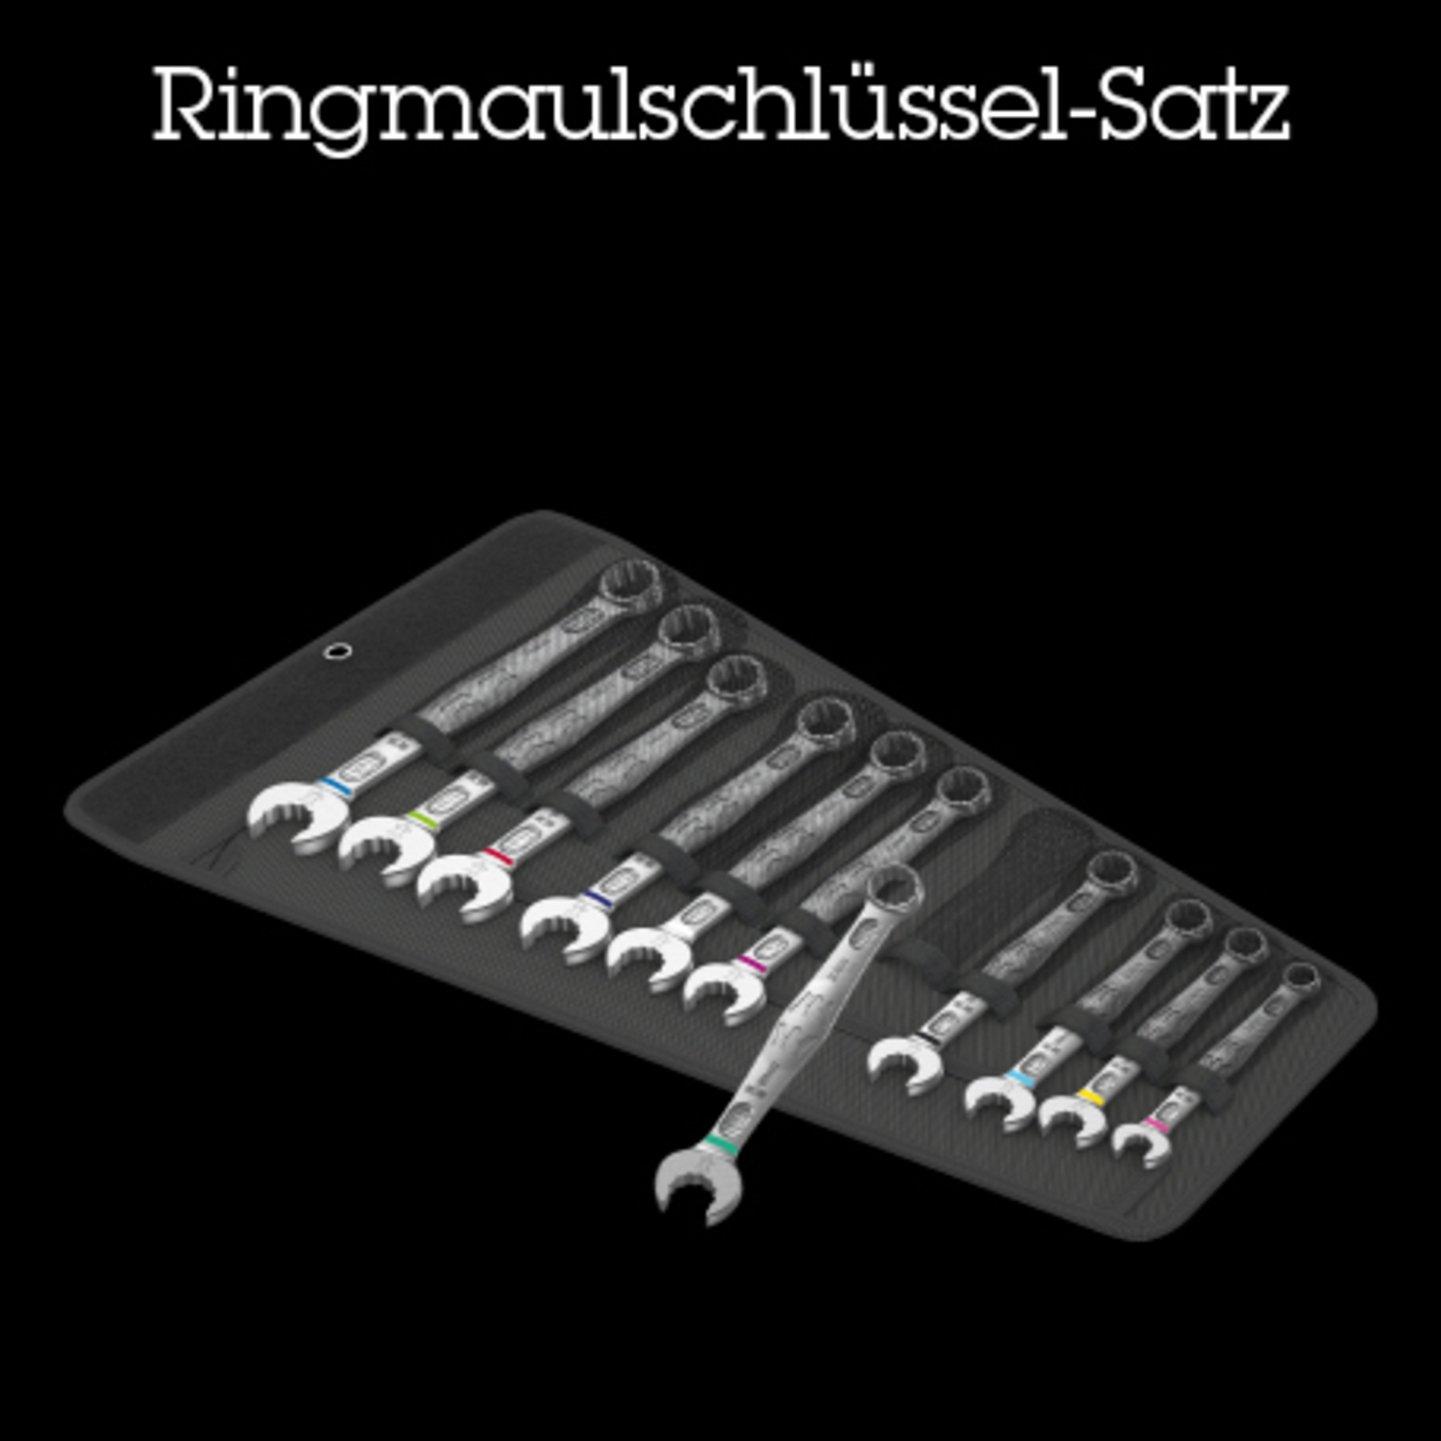 Ringmaulschlüssel-Satz